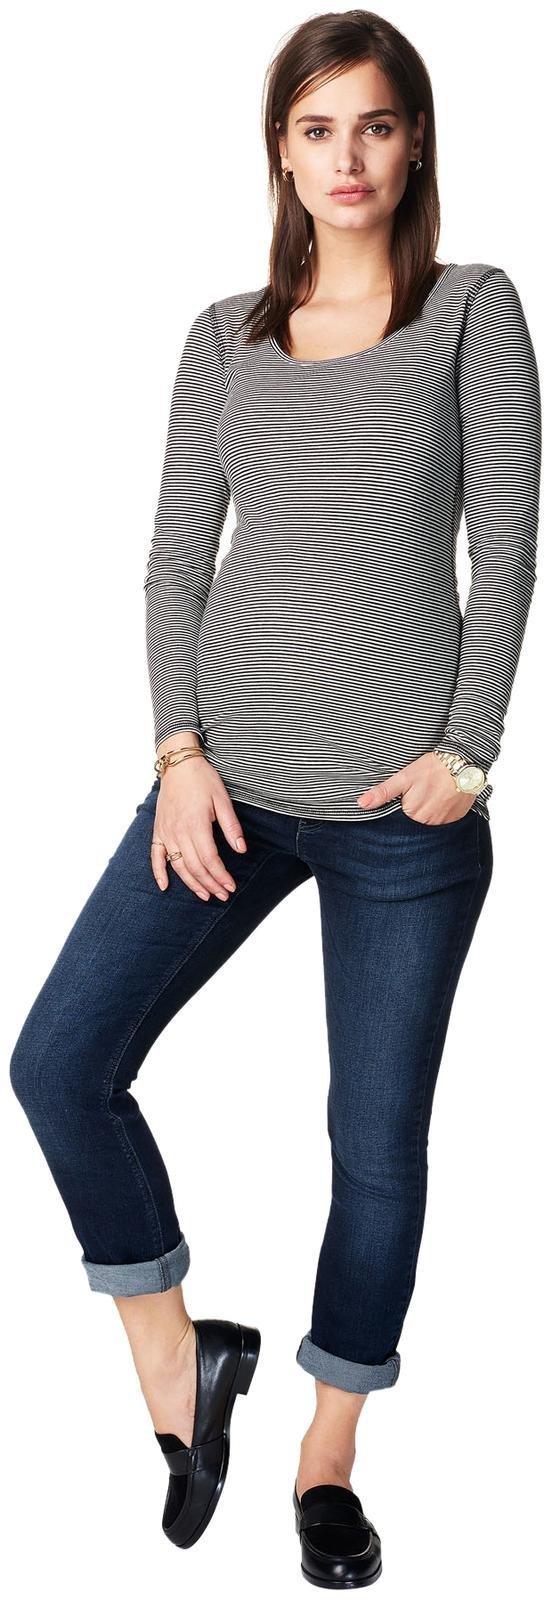 Noppies Women's Maternity Jeans Otb Reg Ann, Mid Blue, 33